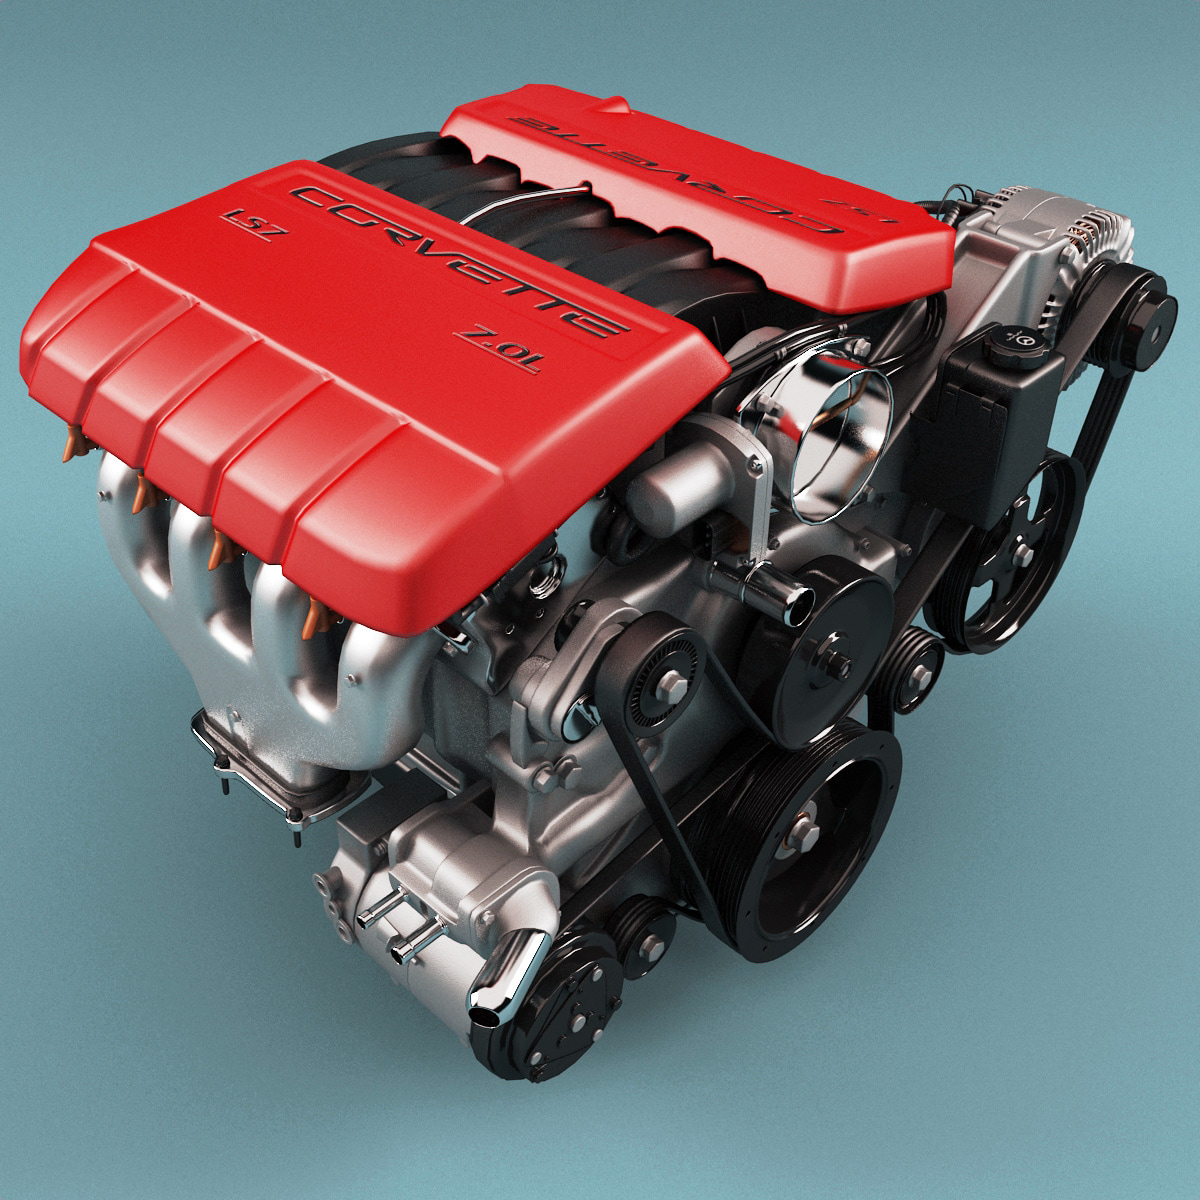 chevrolet corvette ls7 engine motor max